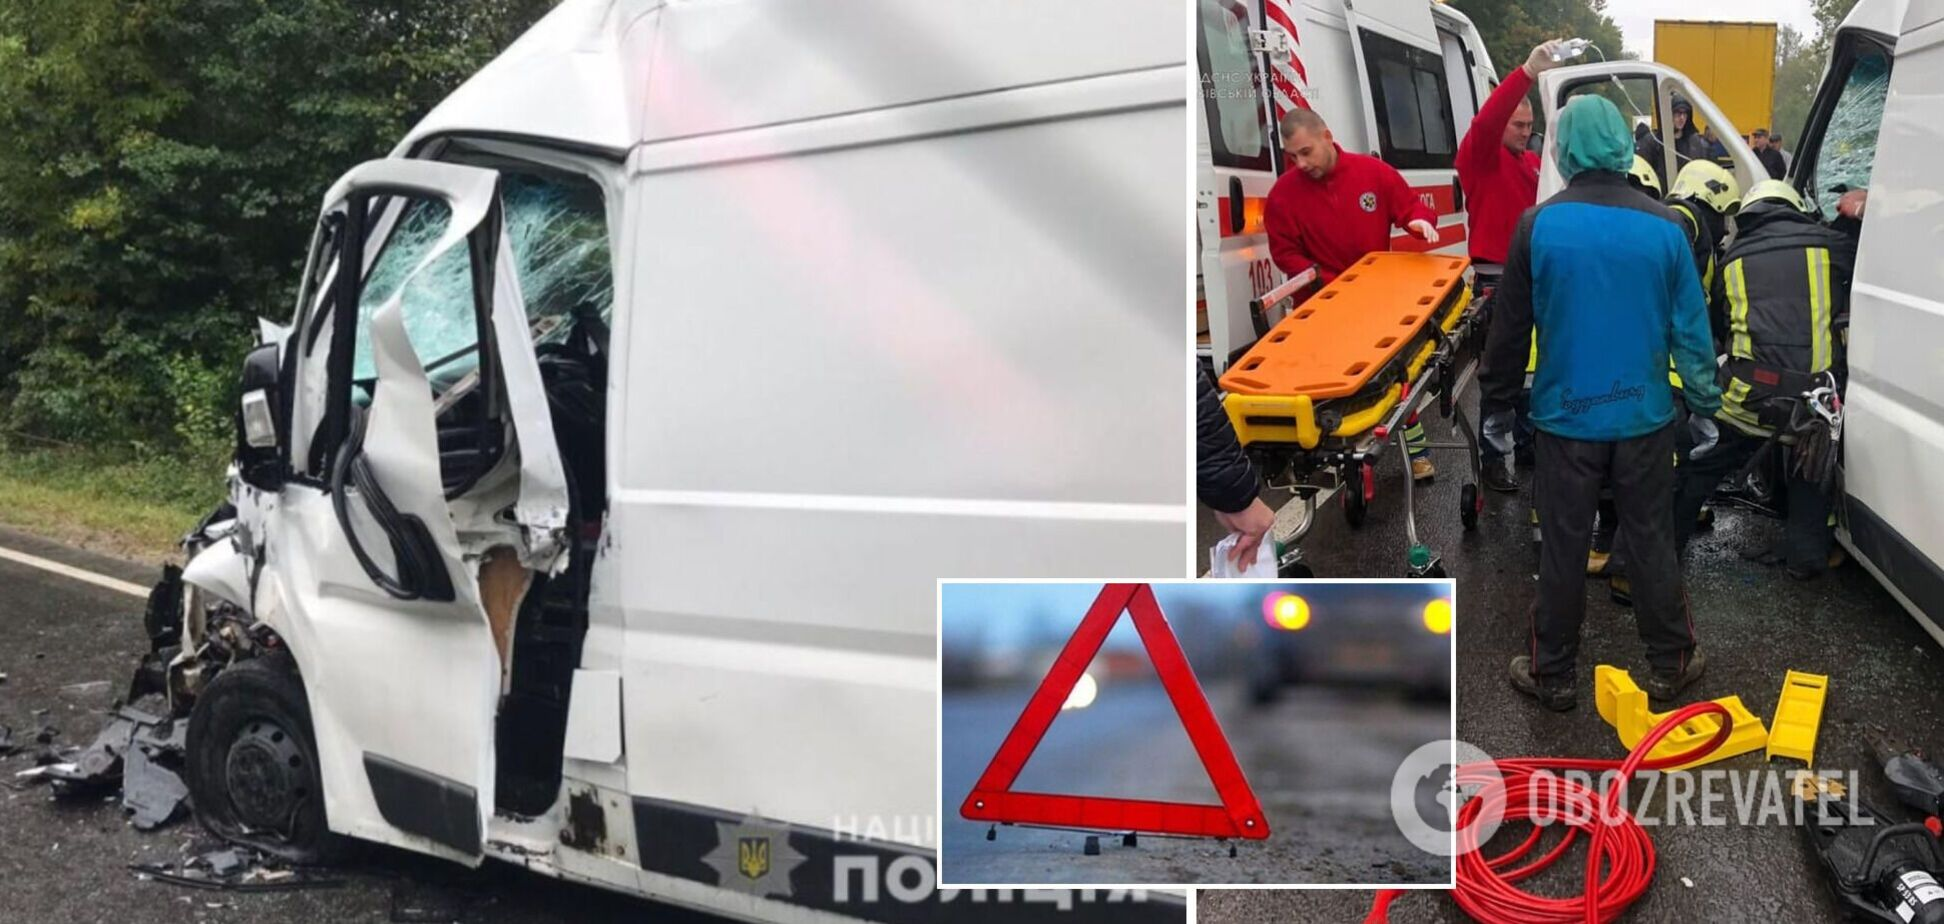 На Львовщине Fiat на скорости влетел в грузовик, водителя зажало в авто. Фото